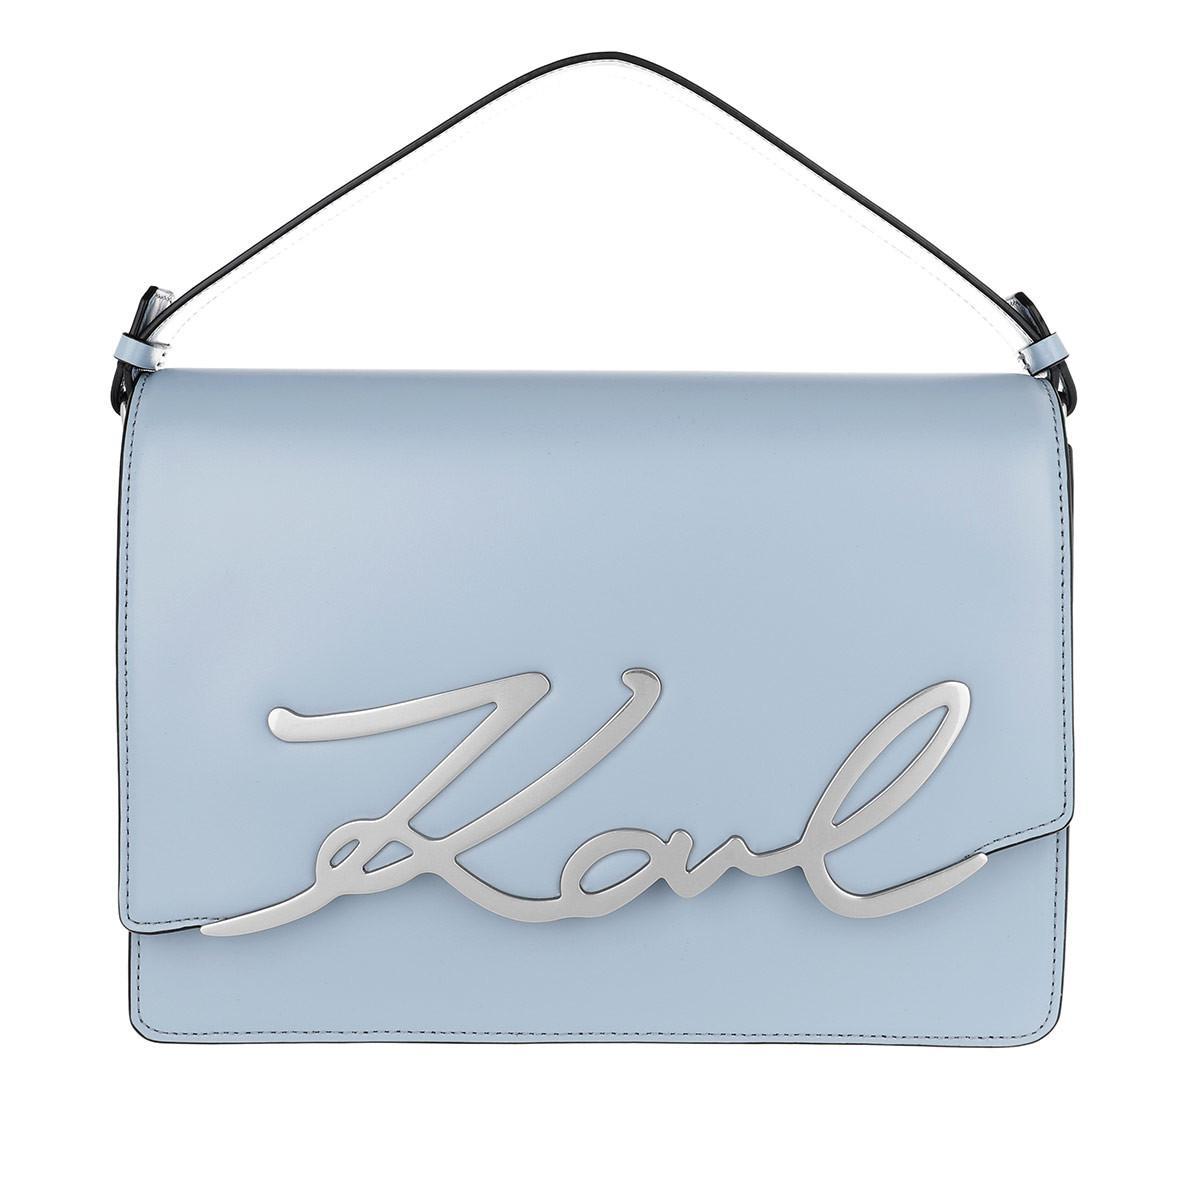 Karl Lagerfeld Satchel Bags - K/Signature Big Shoulderbag Mistic - - Satchel Bags for ladies Clearance Marketable uKmb2s16b